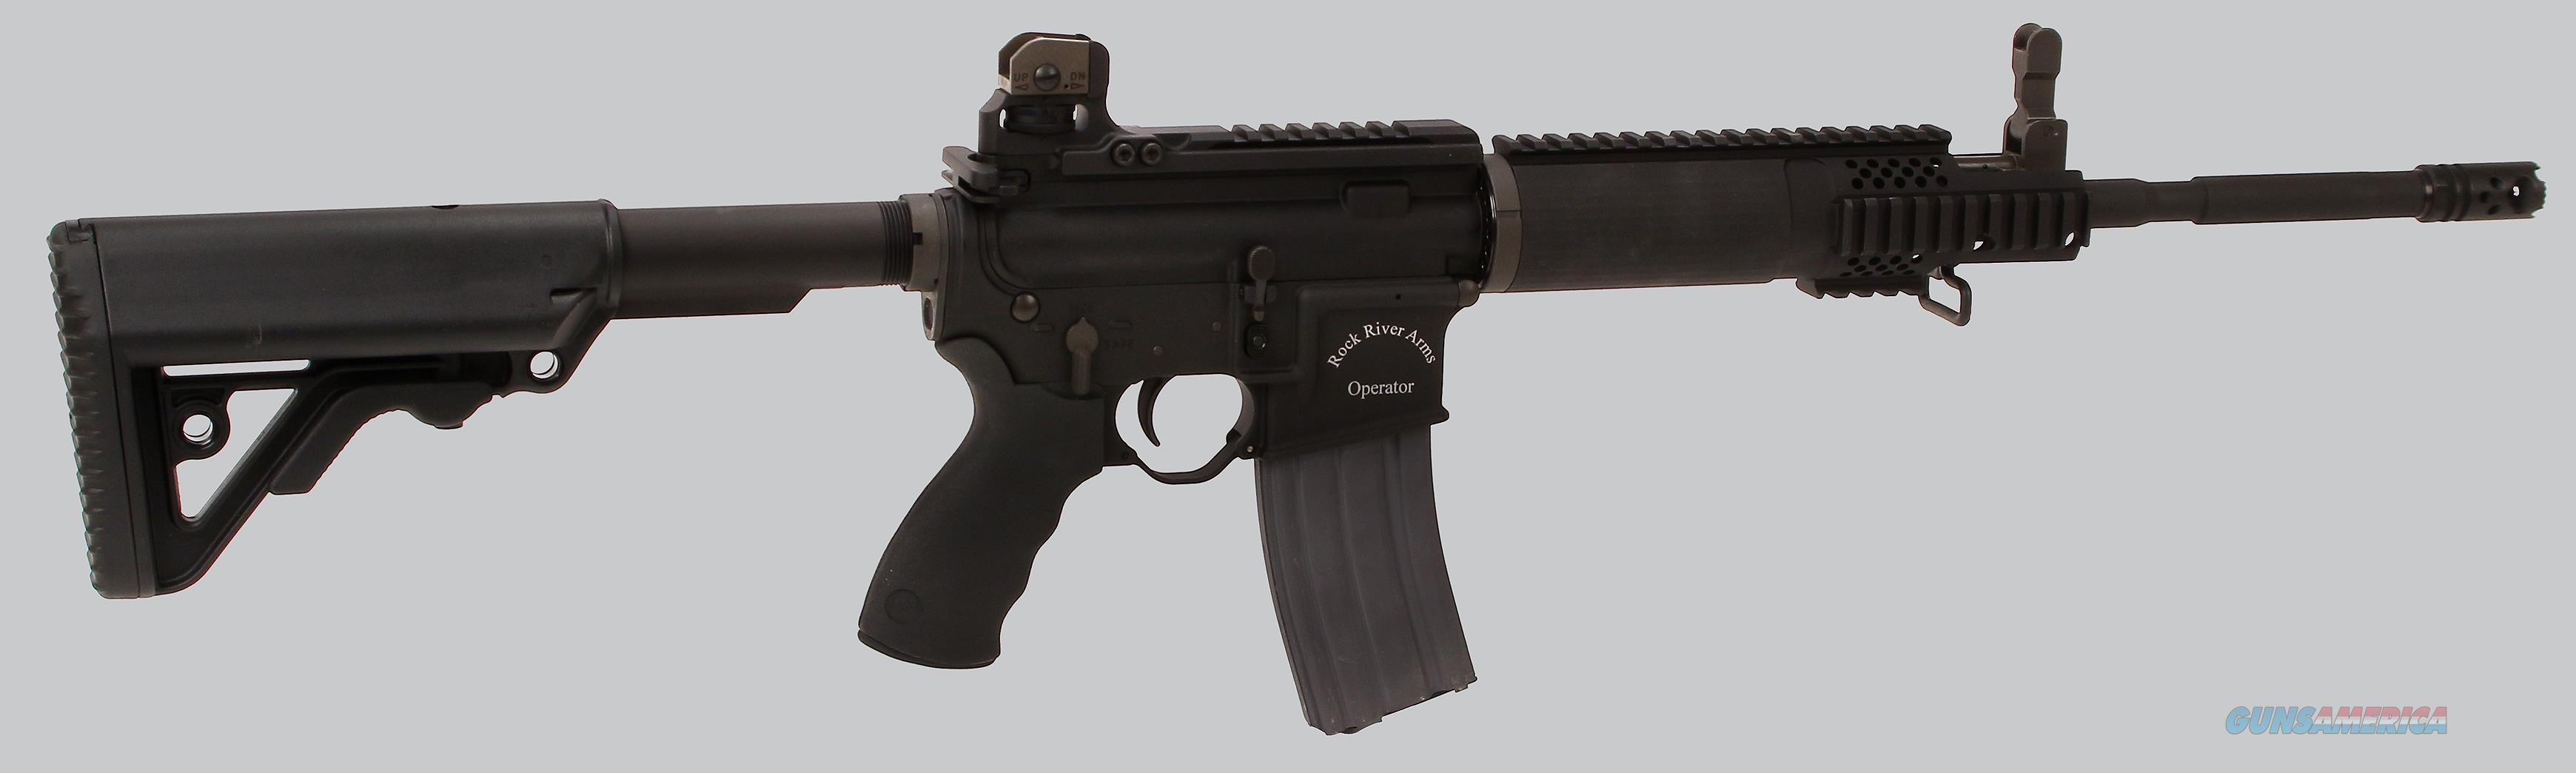 "Rock River Arms ""Left Hand"" LAR-15LH Semi Auto 5.56 Rifle  Guns > Rifles > Rock River Arms Rifles"